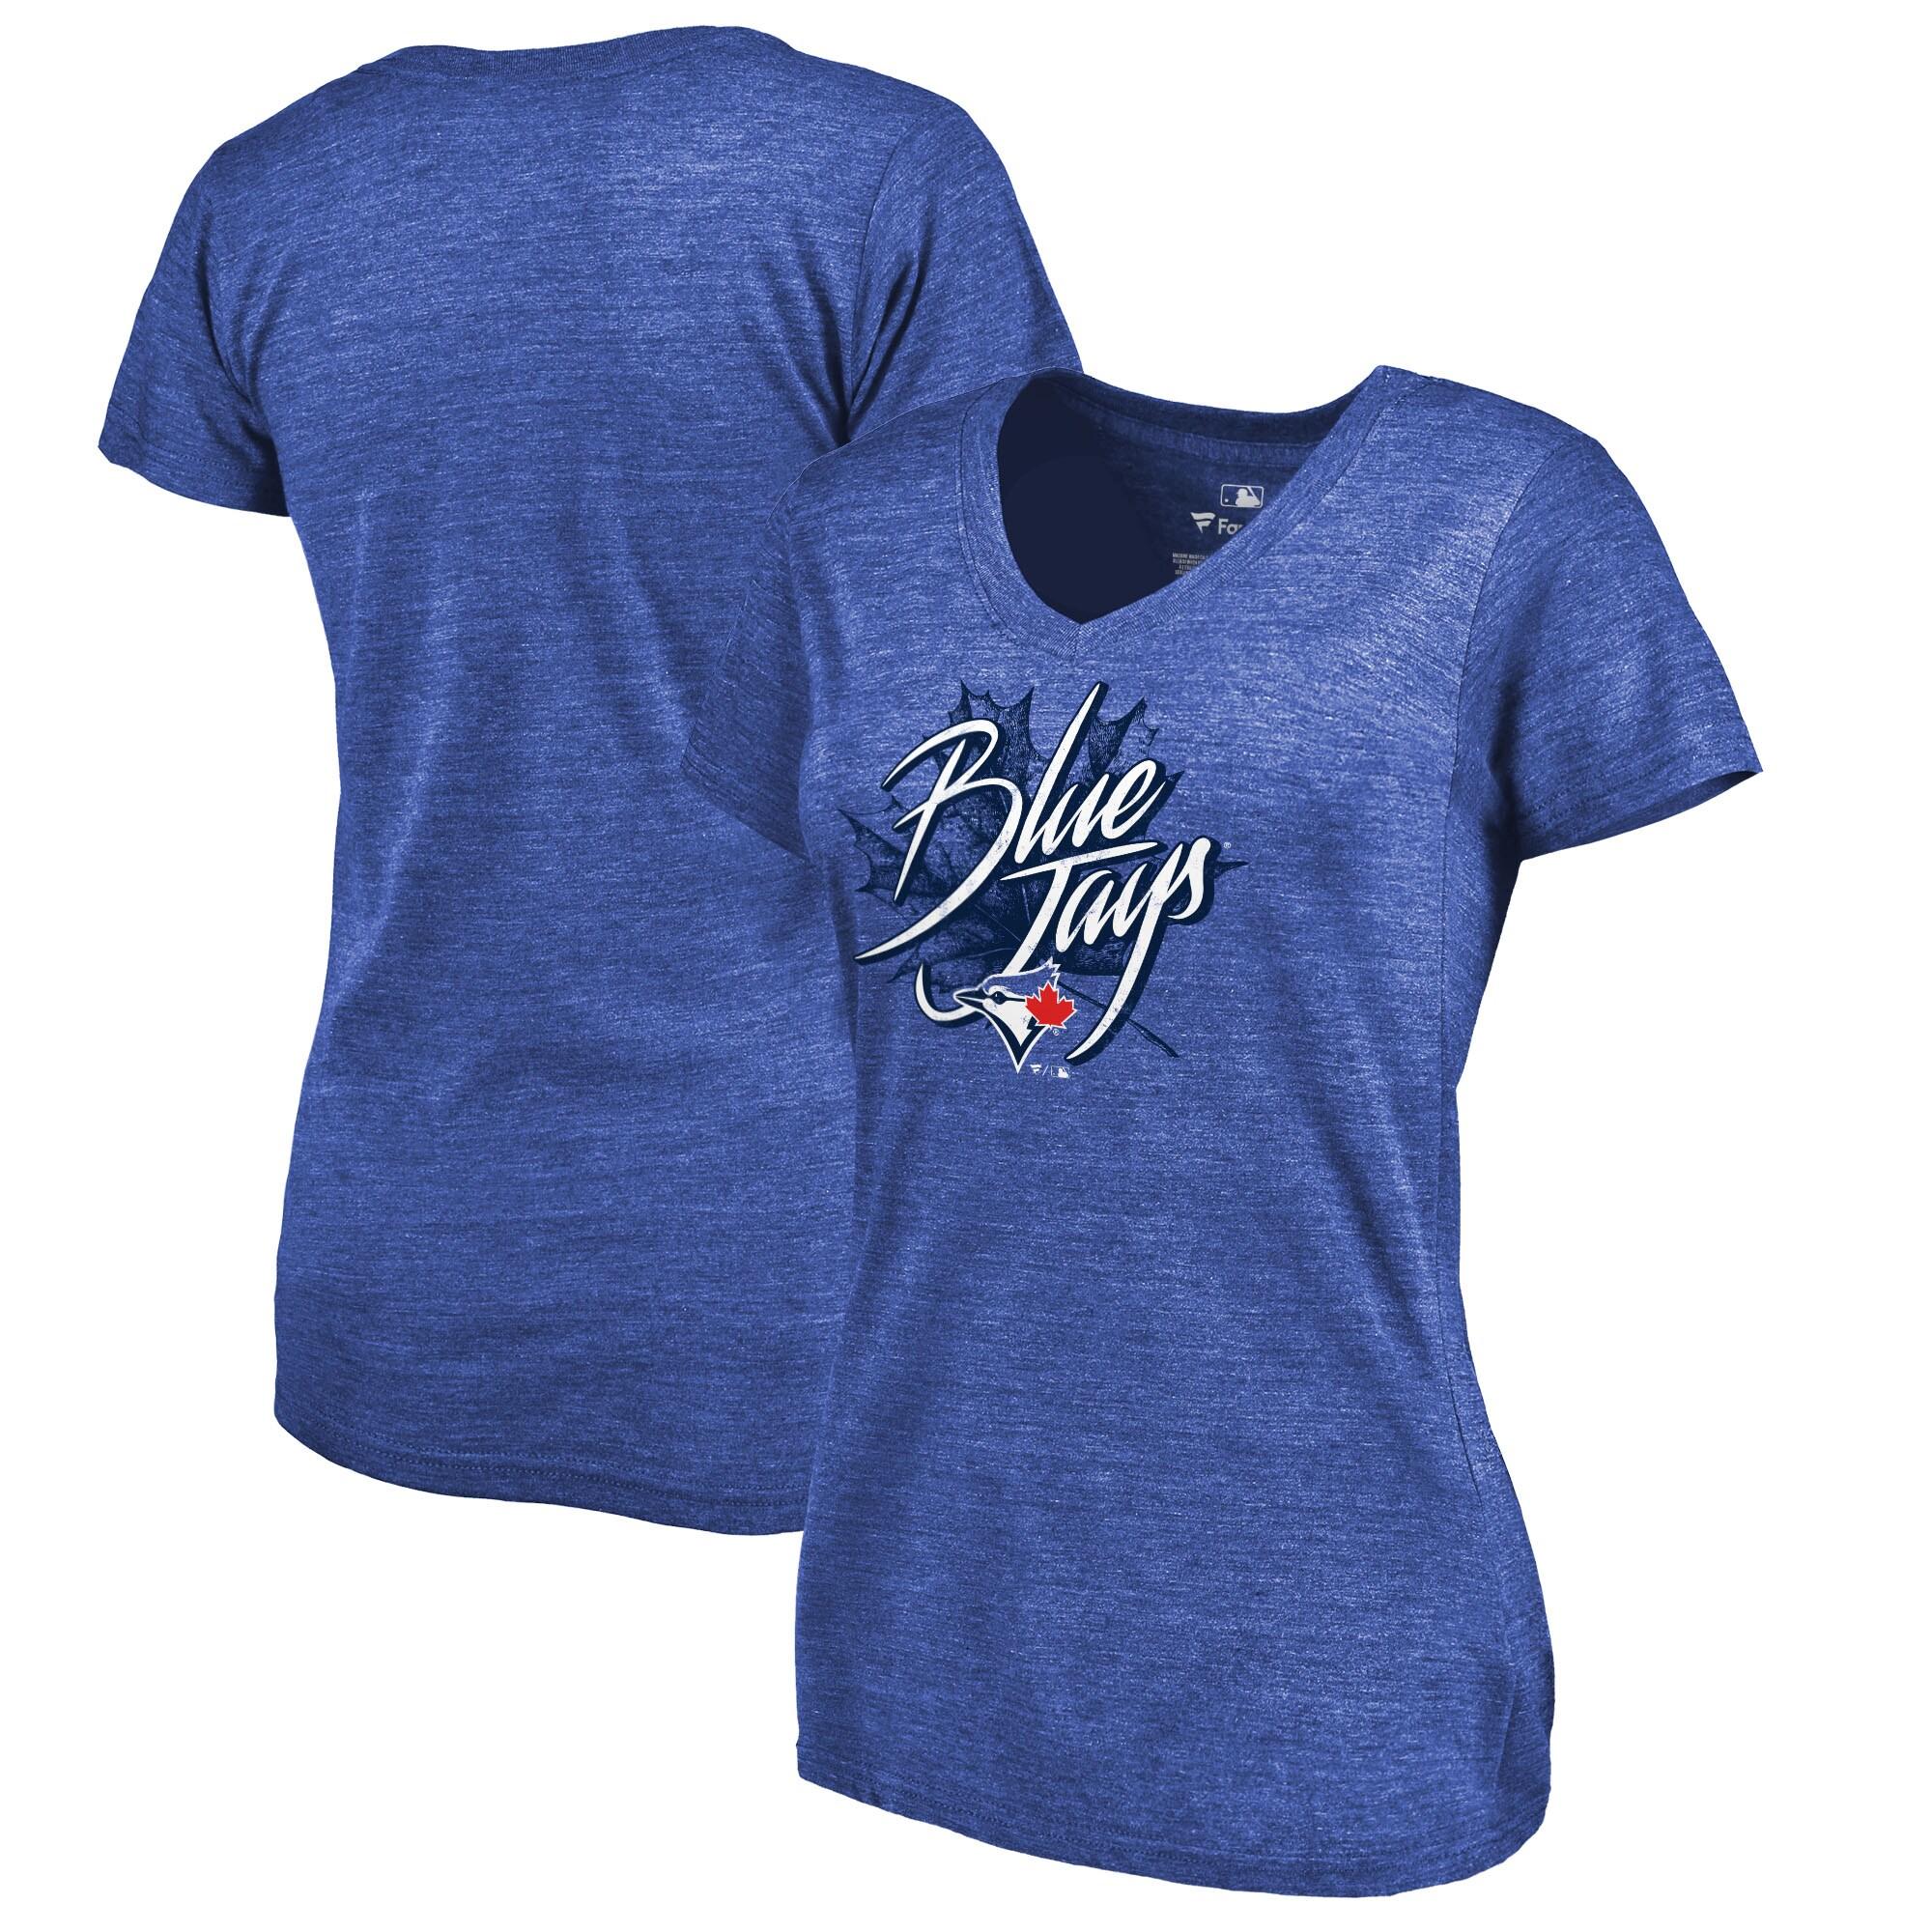 Toronto Blue Jays Fanatics Branded Women's Hometown Collection Blue Leaf V-Neck T-Shirt - Royal